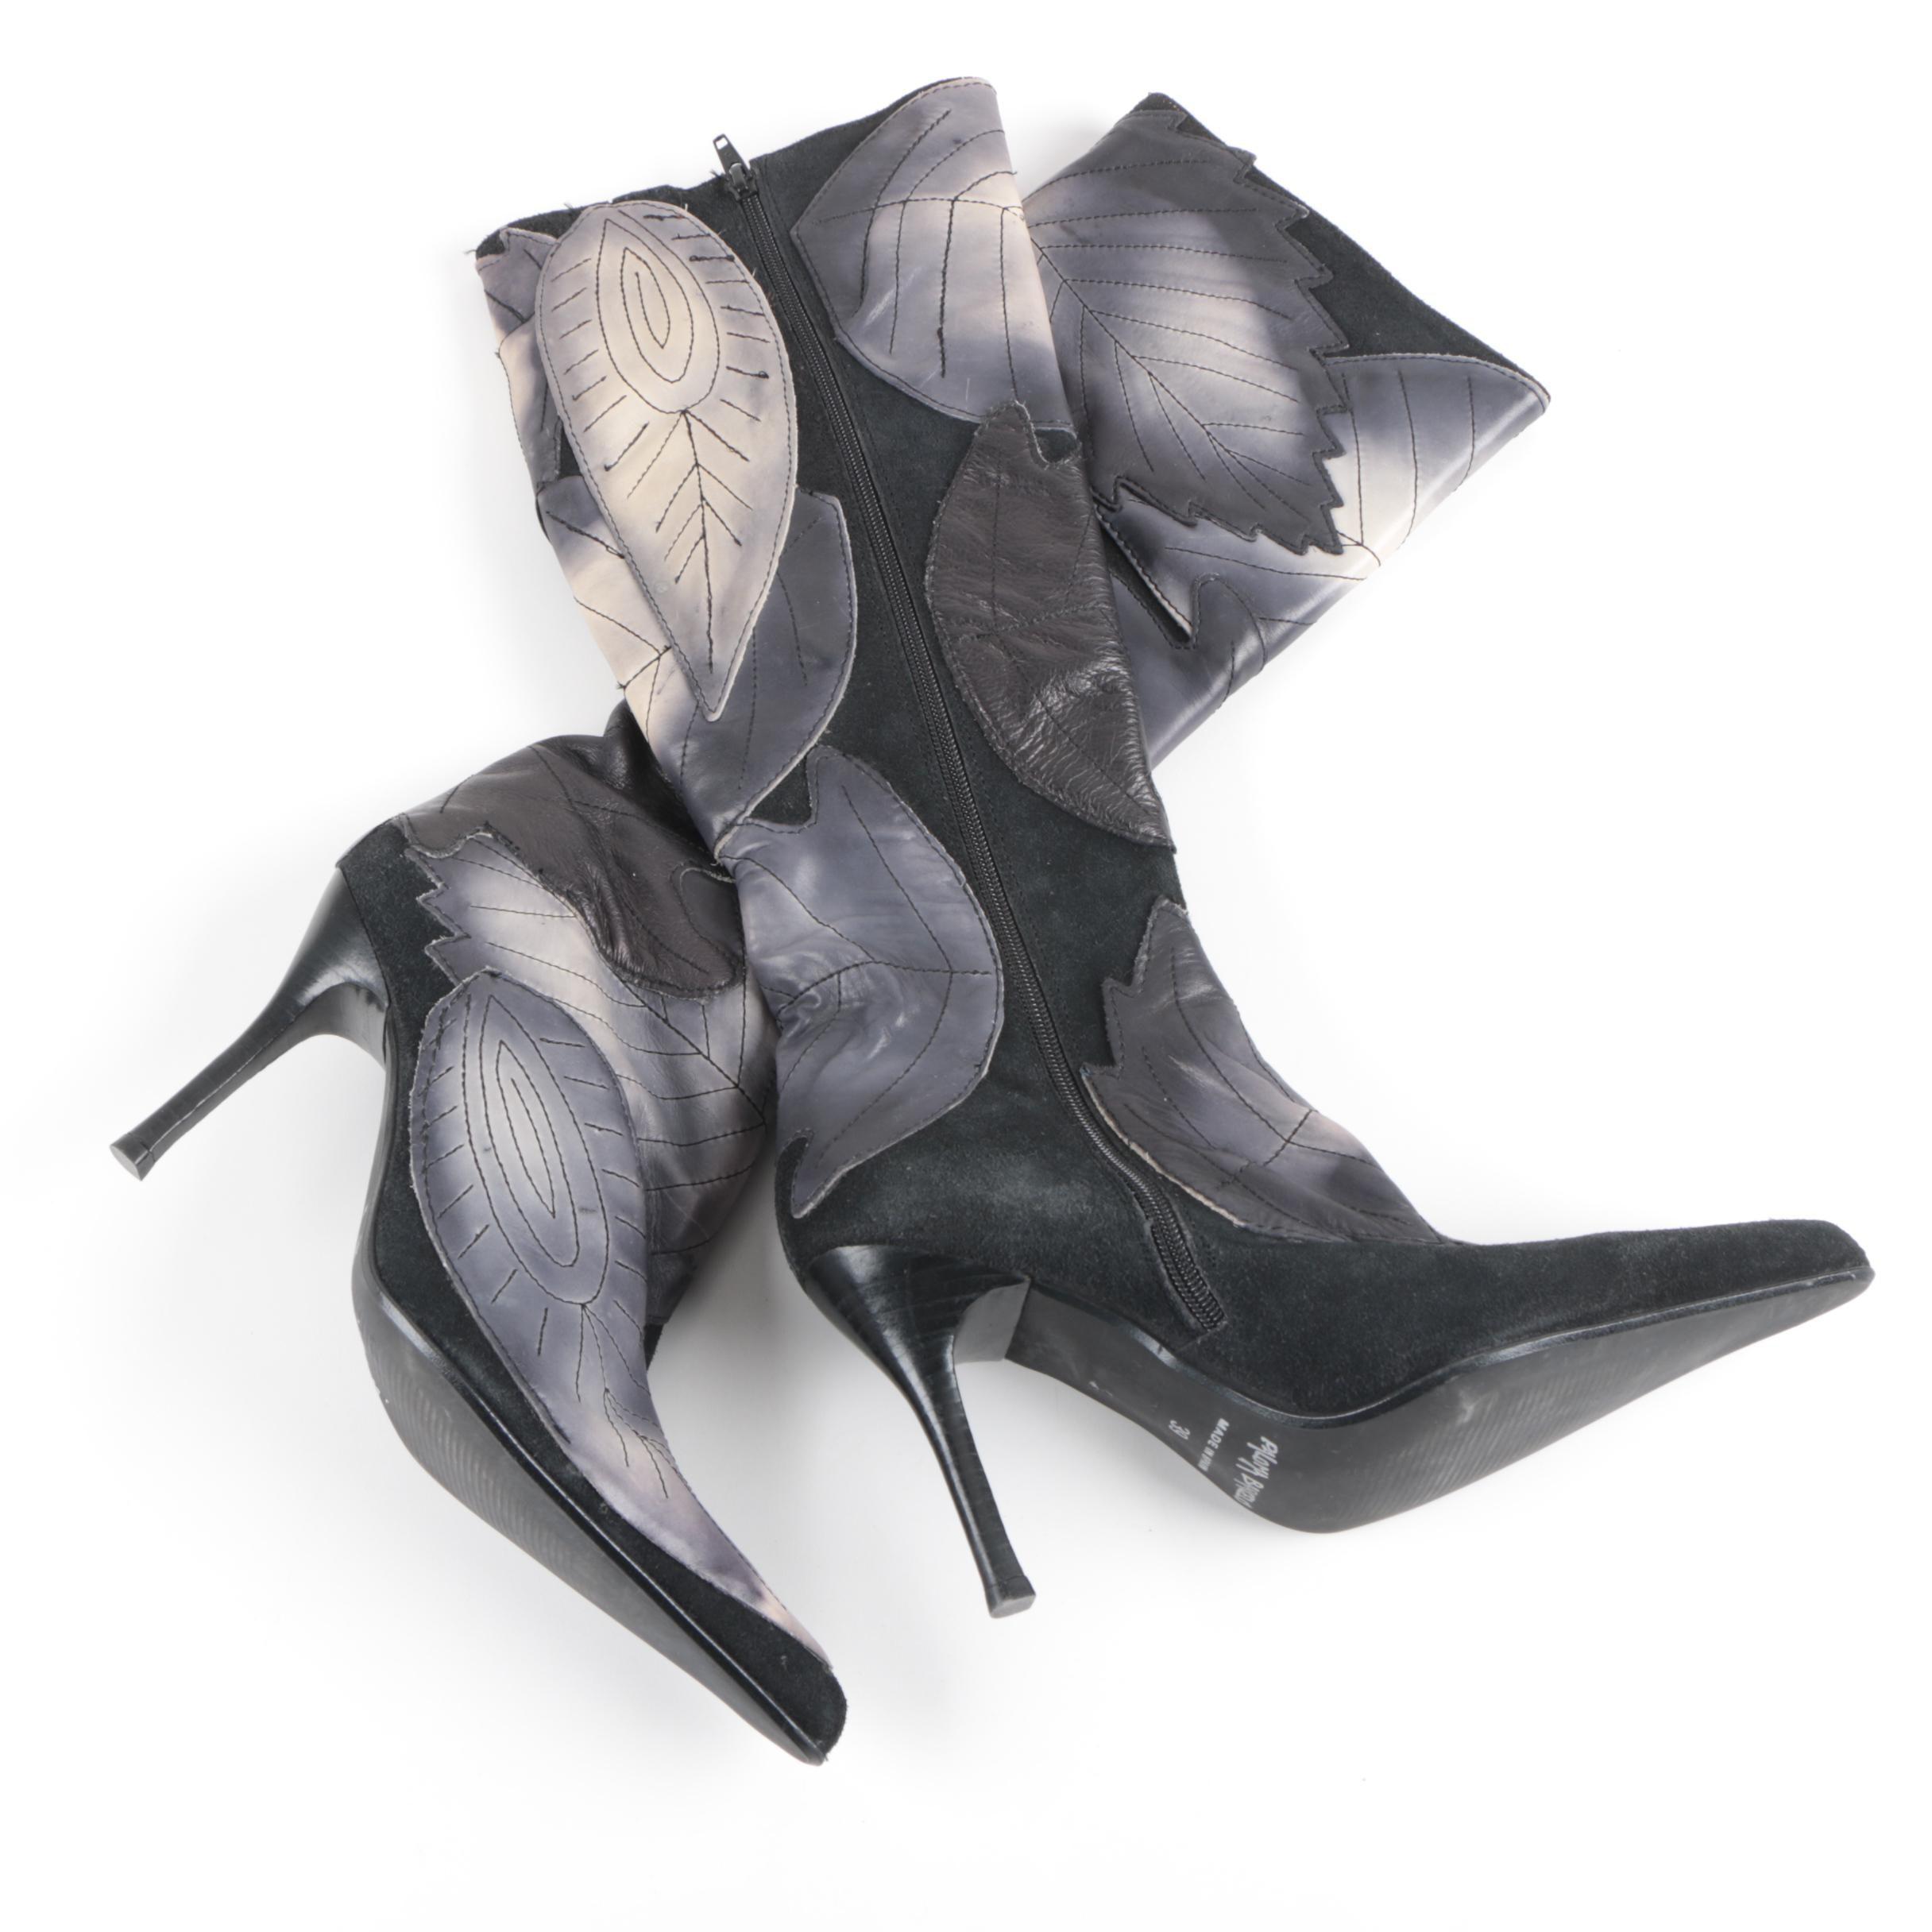 Paloma Barceló Leather Stiletto Statement Boots